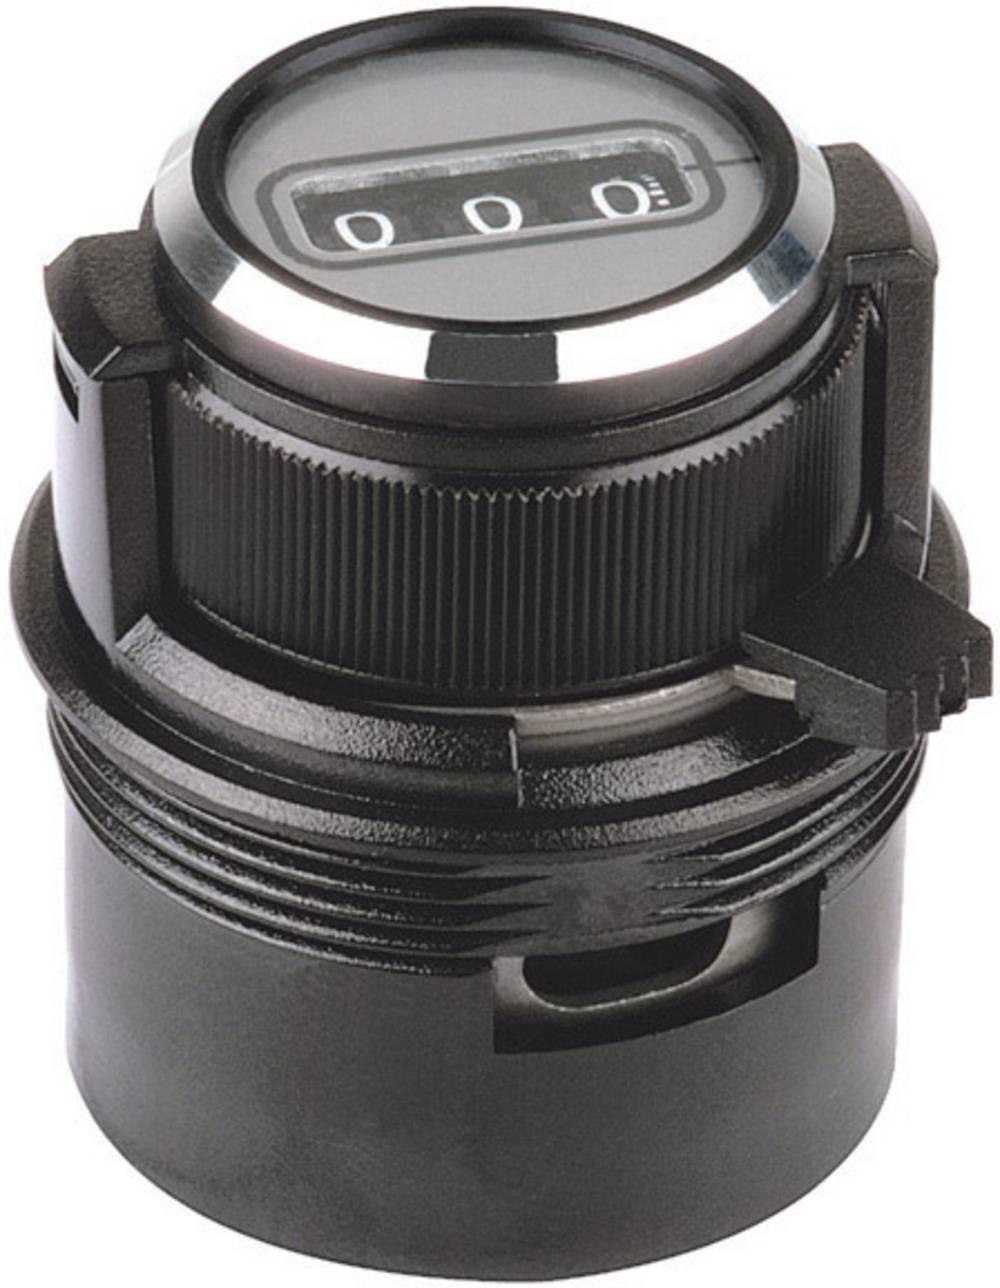 Mentor Digitalni Rotirajući gumb DIGITAL-KNOPF crna promjerosi 6.35mm 6622.1000